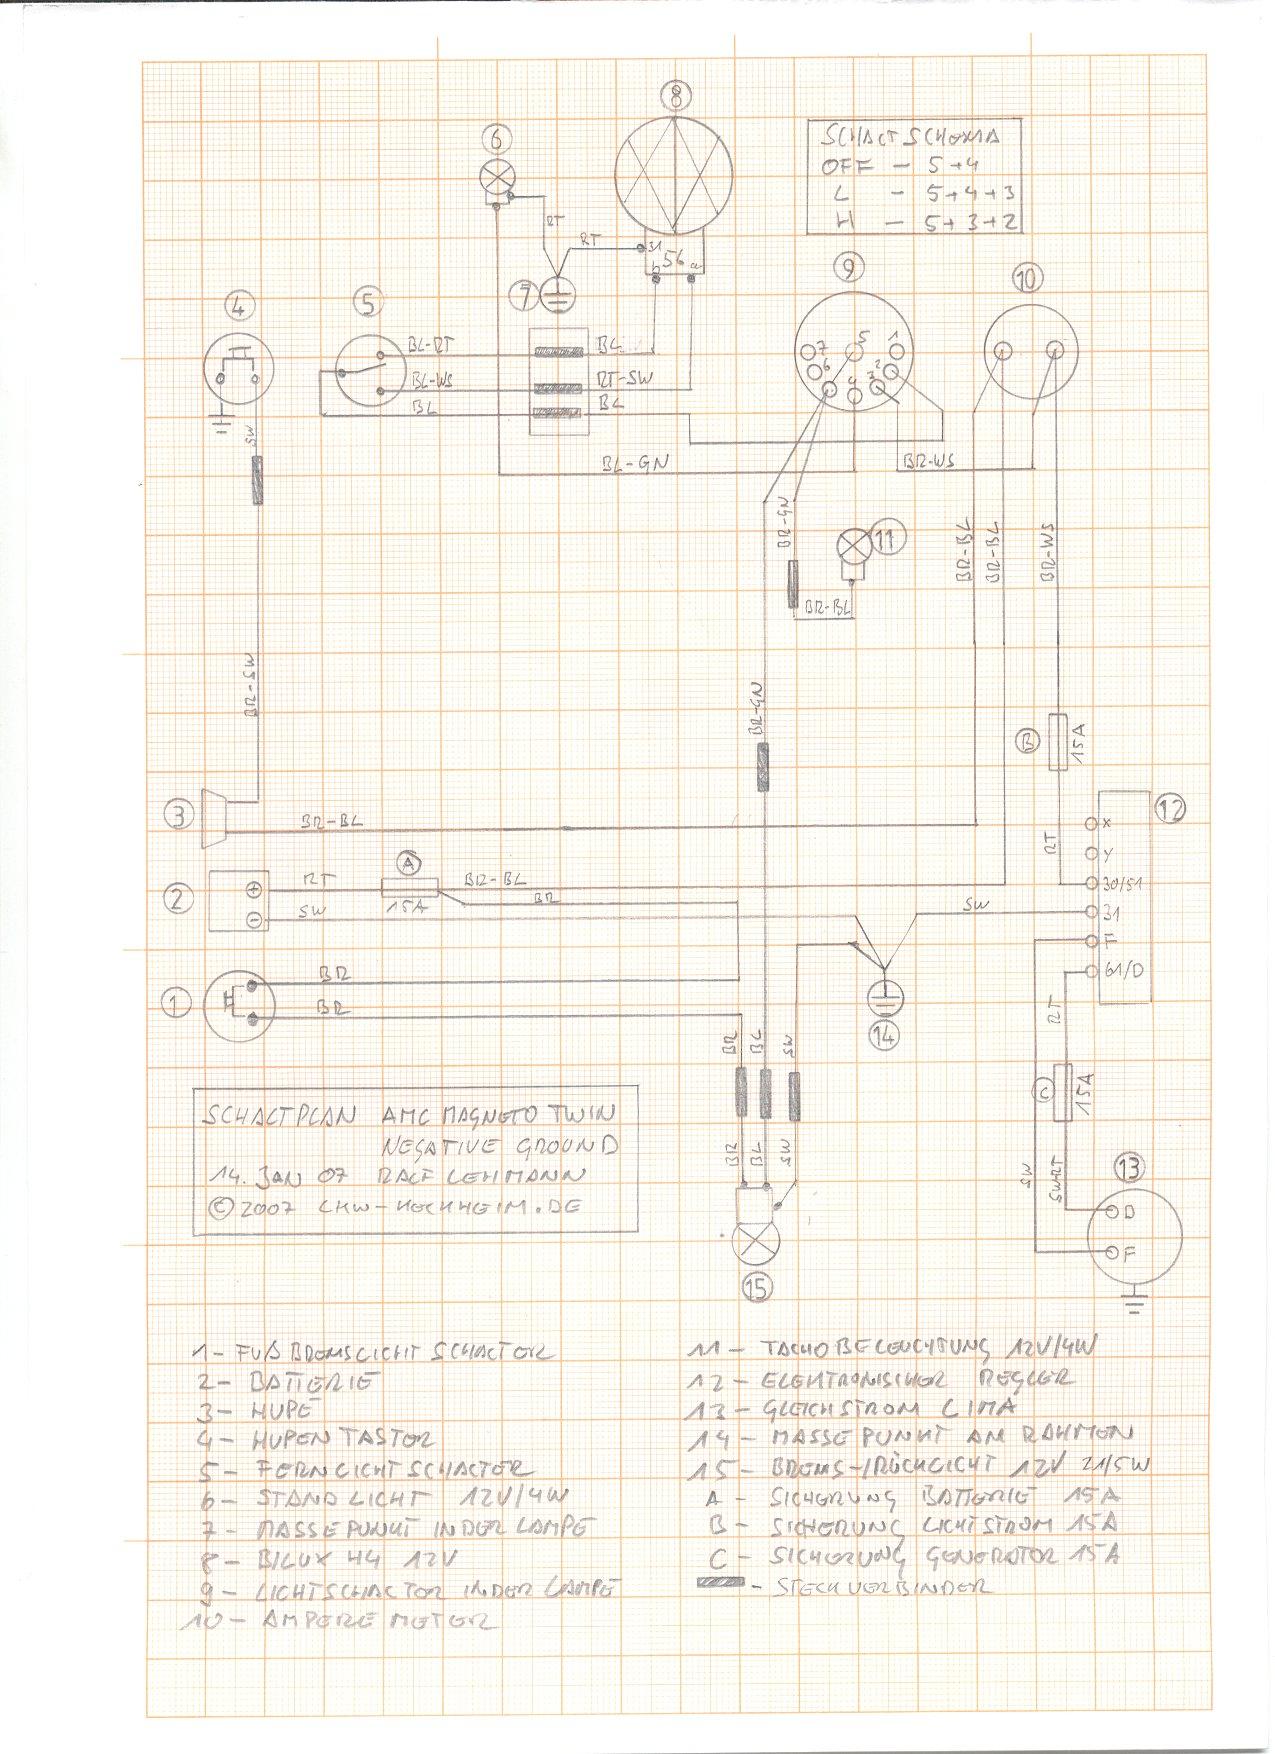 Atemberaubend Magneto Schaltplan Fotos - Schaltplan Serie Circuit ...